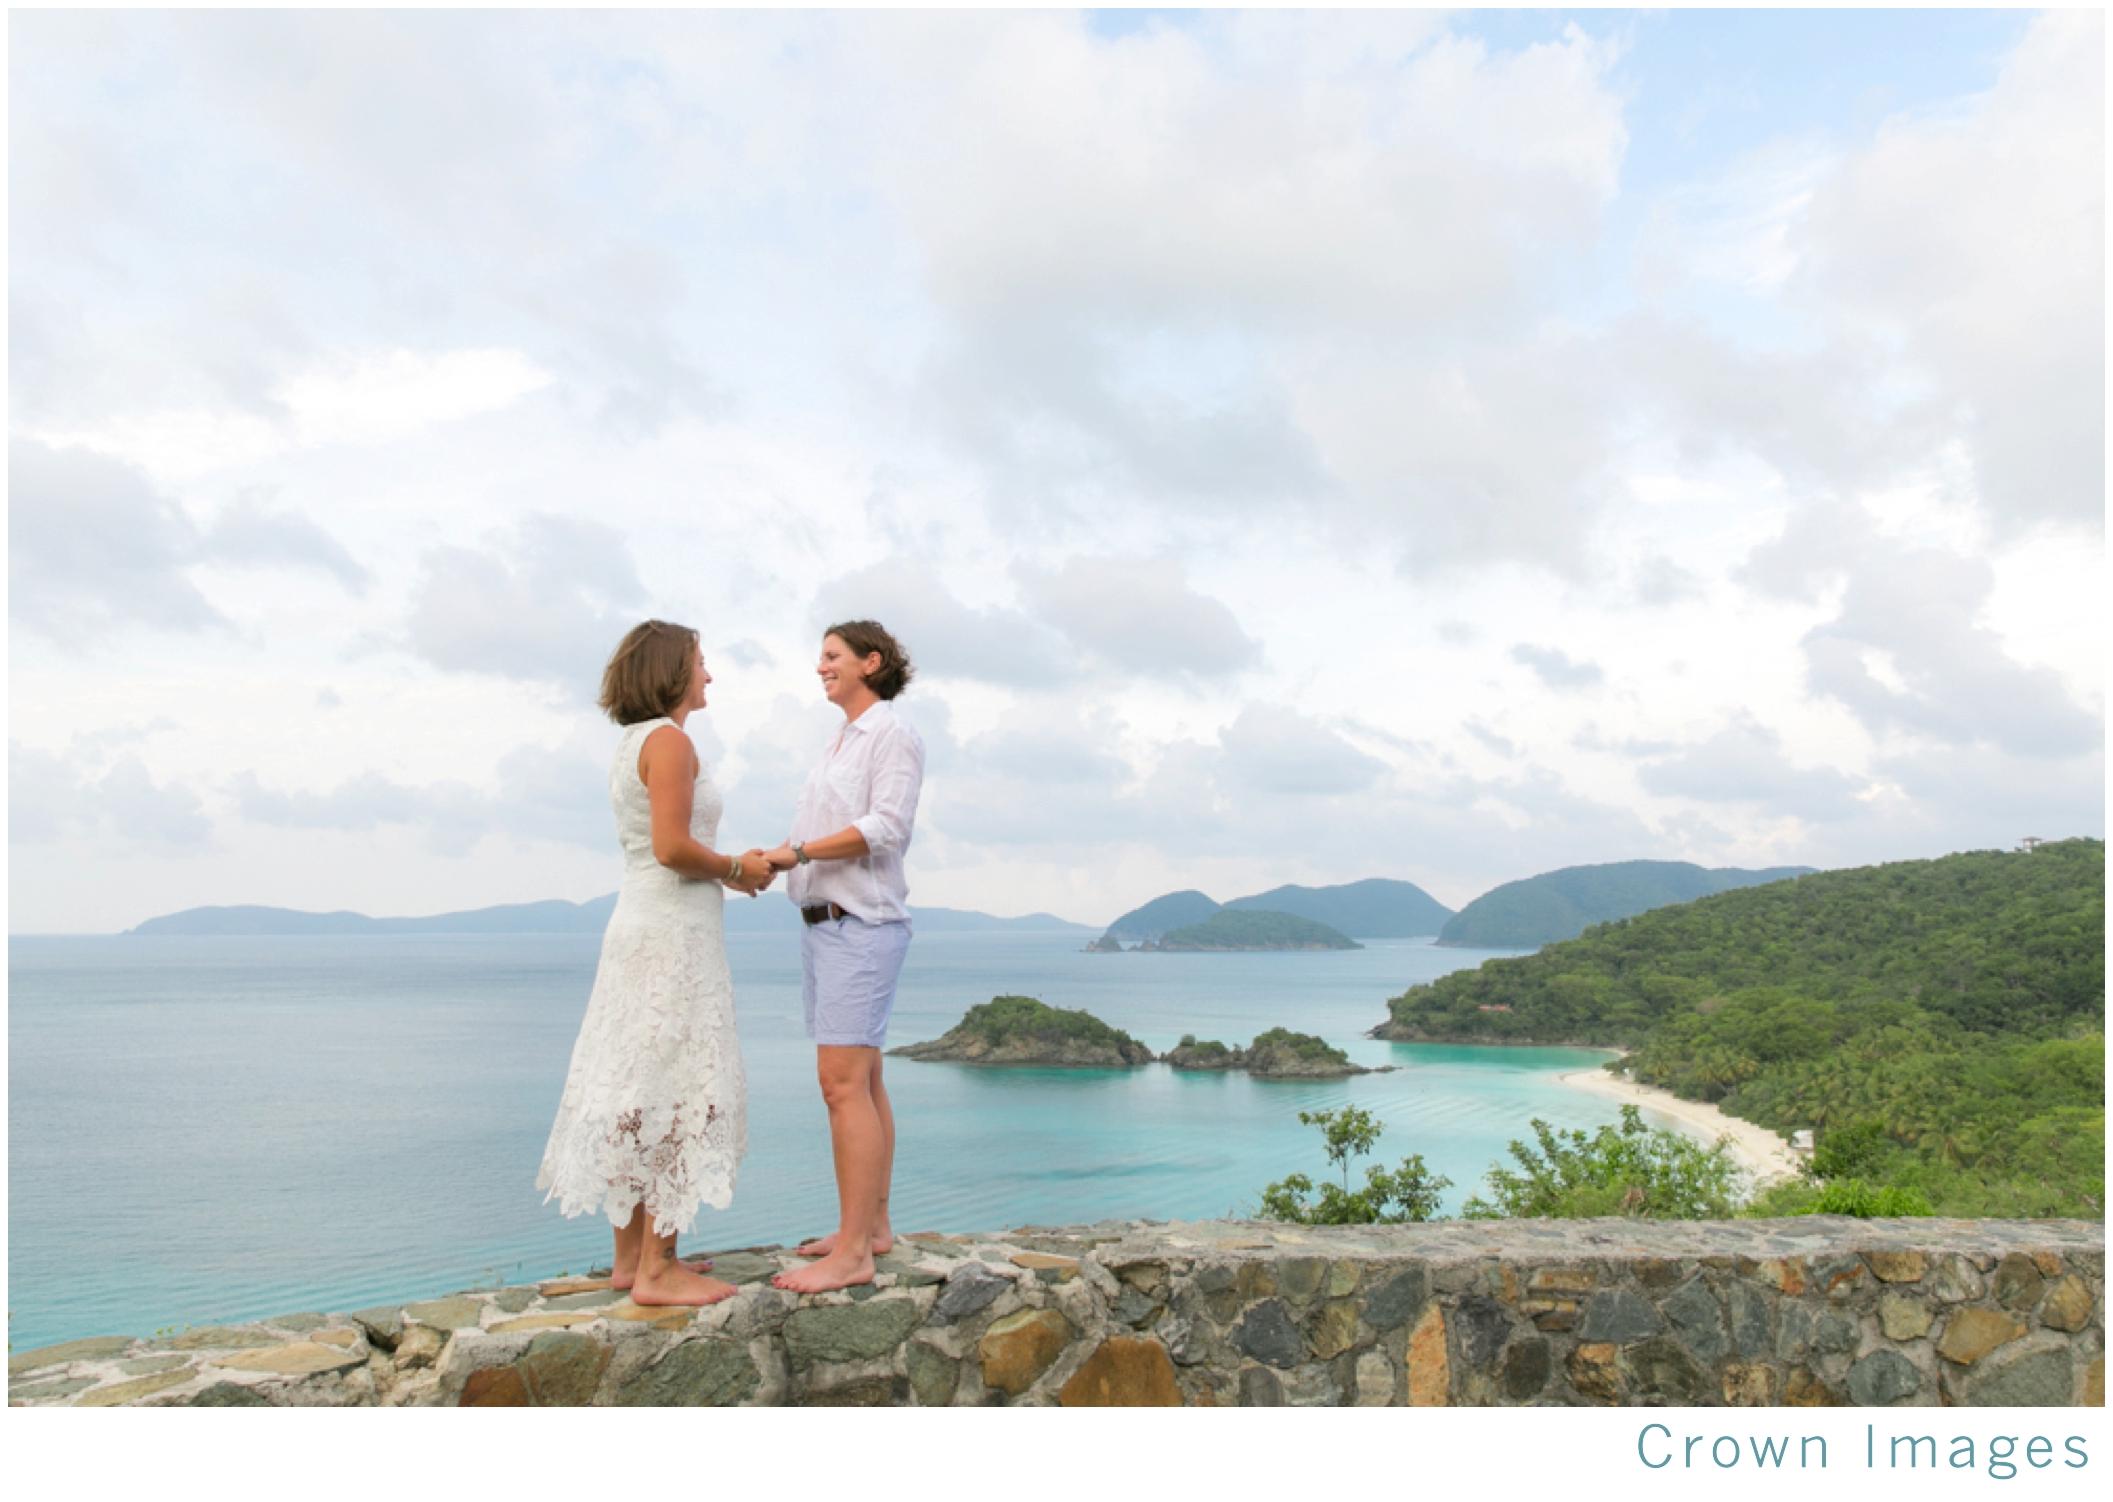 st-john-wedding-photos-crown-images